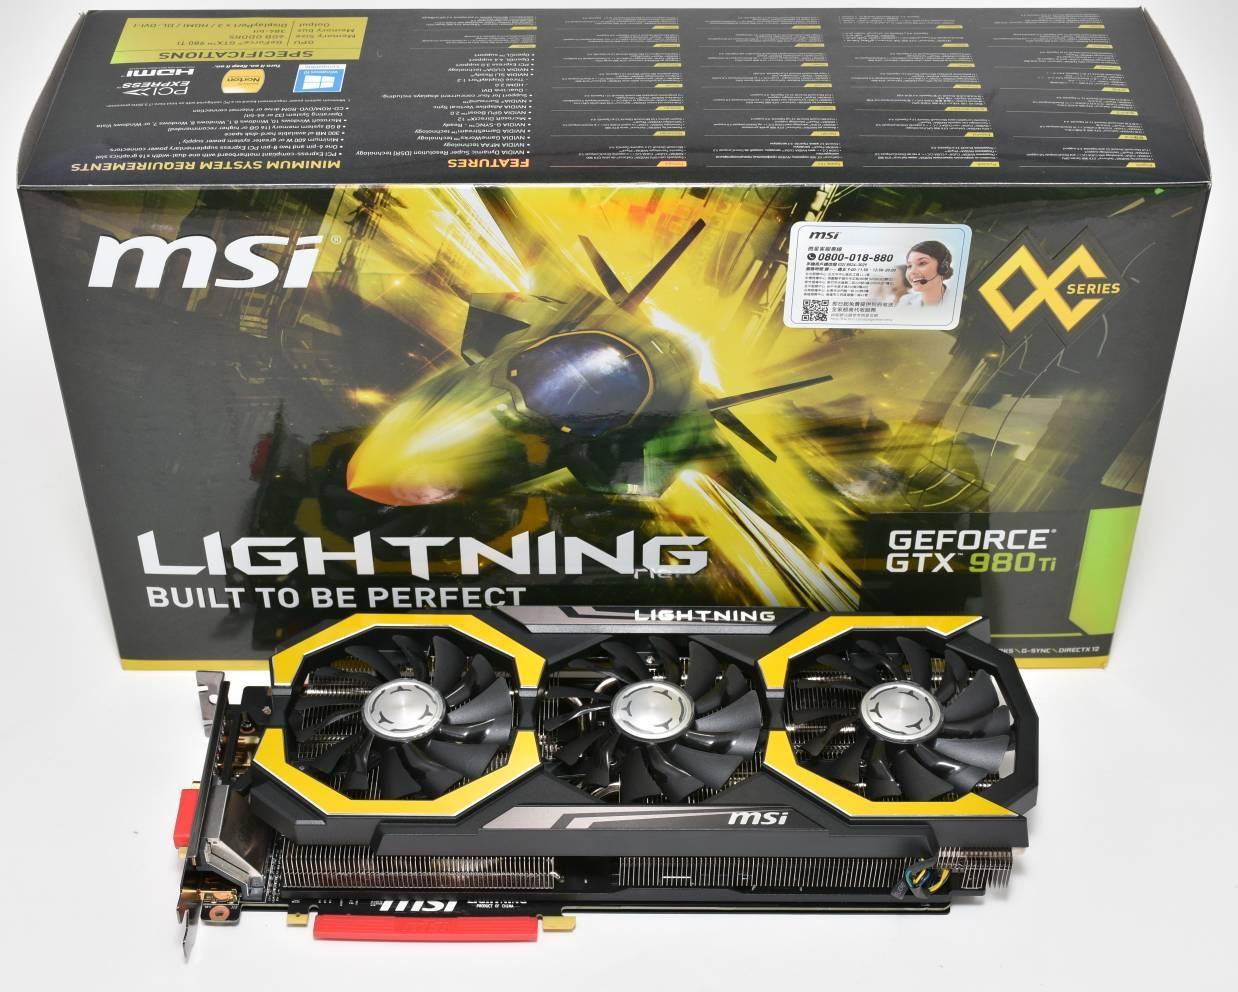 msi lightning geforce gtx 980 ti